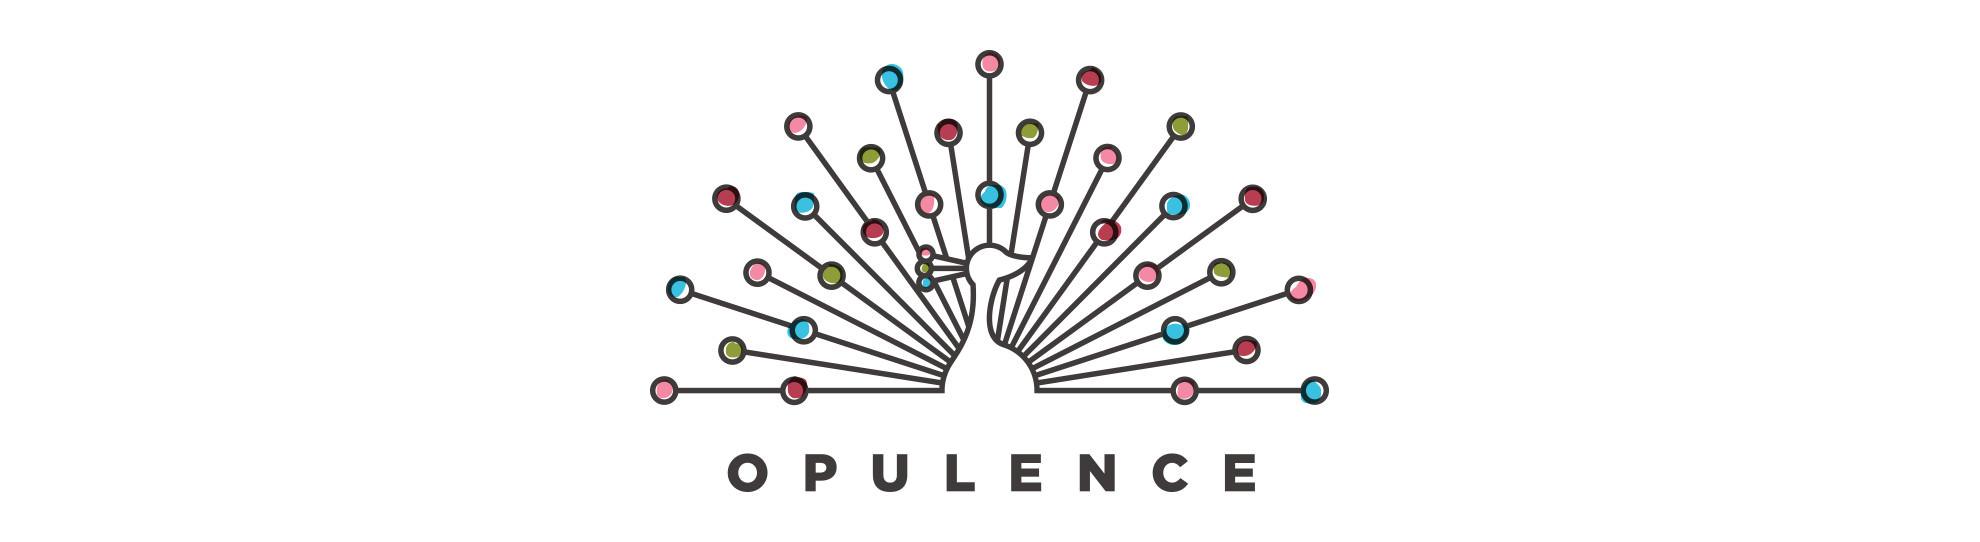 Opulence.jpg